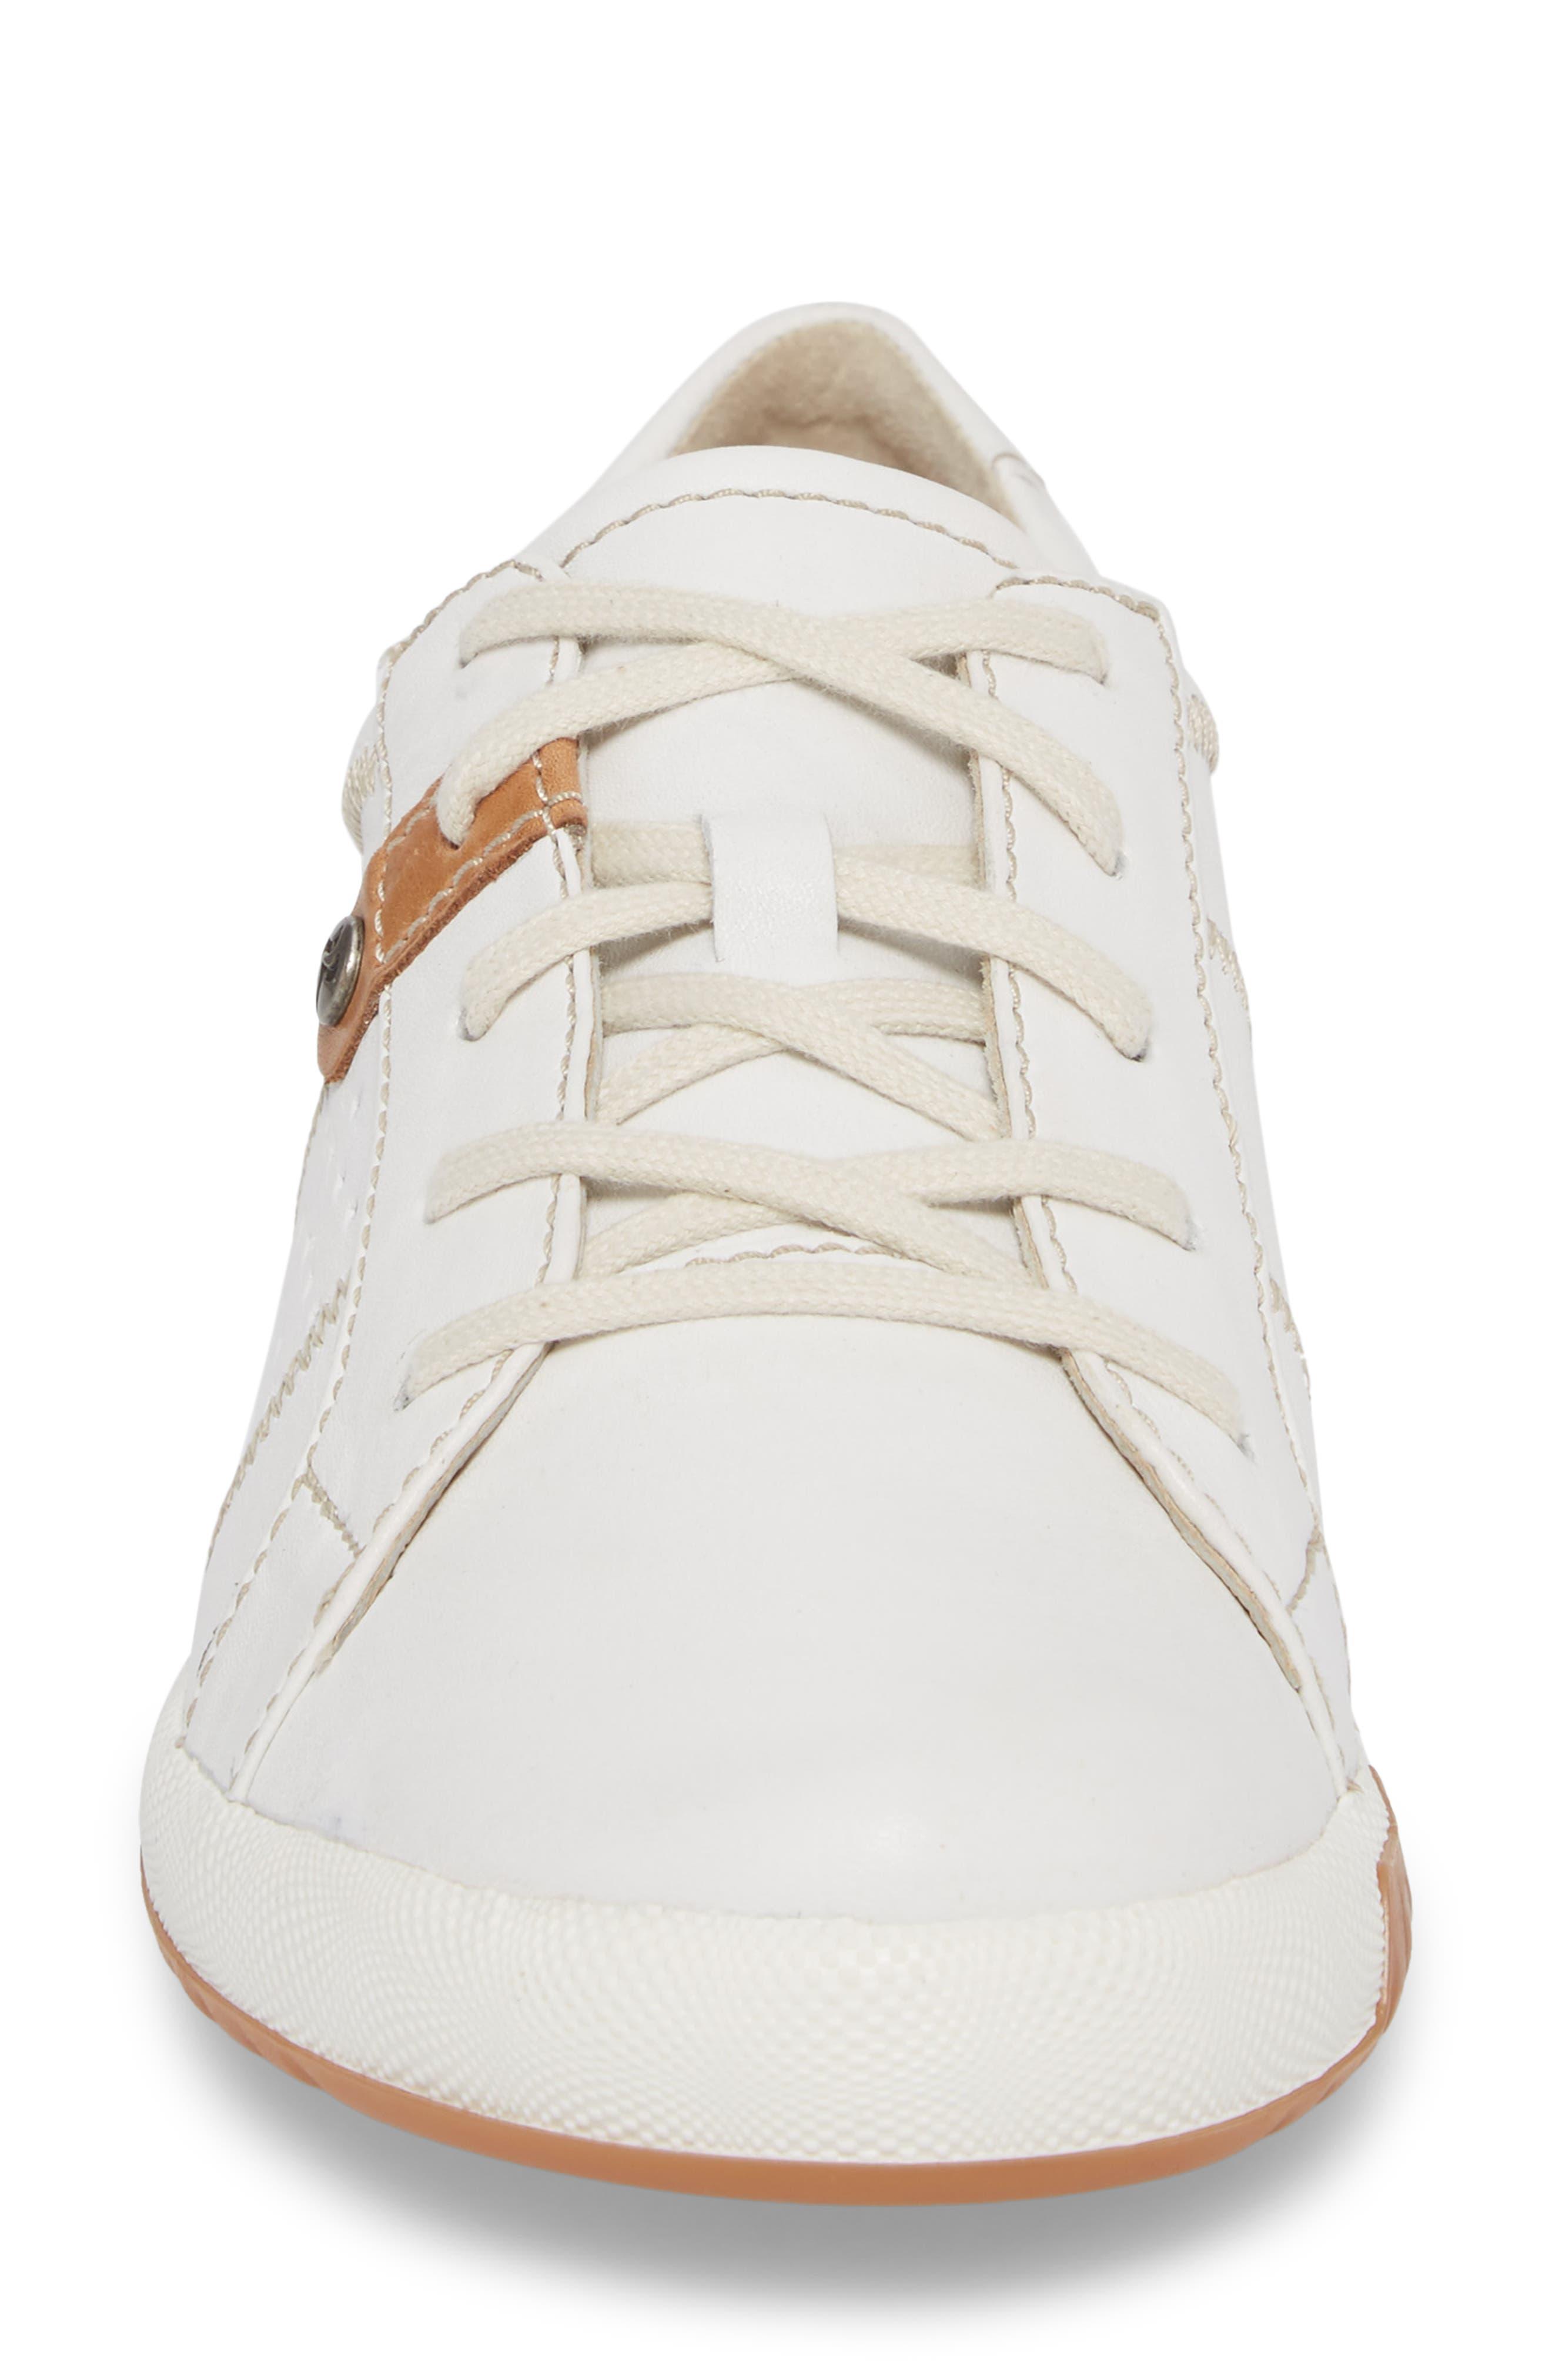 Cordoba 01 Sneaker,                             Alternate thumbnail 4, color,                             WHITE LEATHER